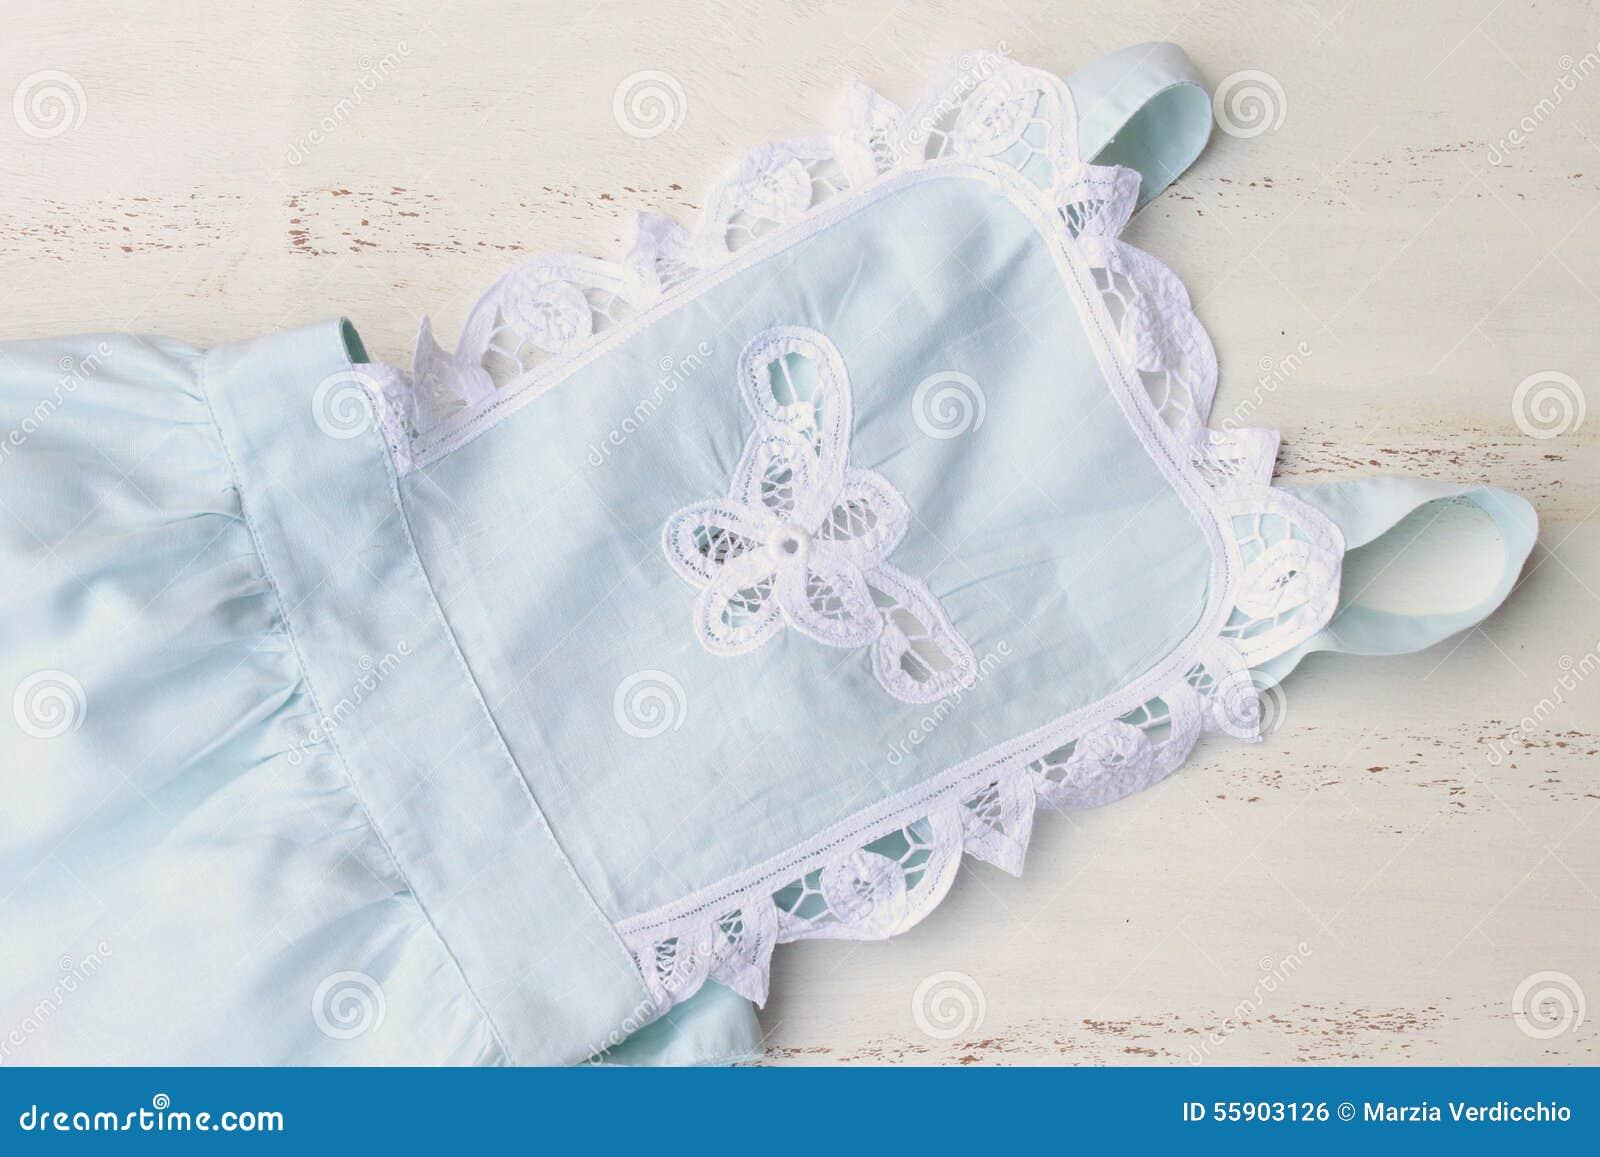 White apron green thumb - Maid Apron